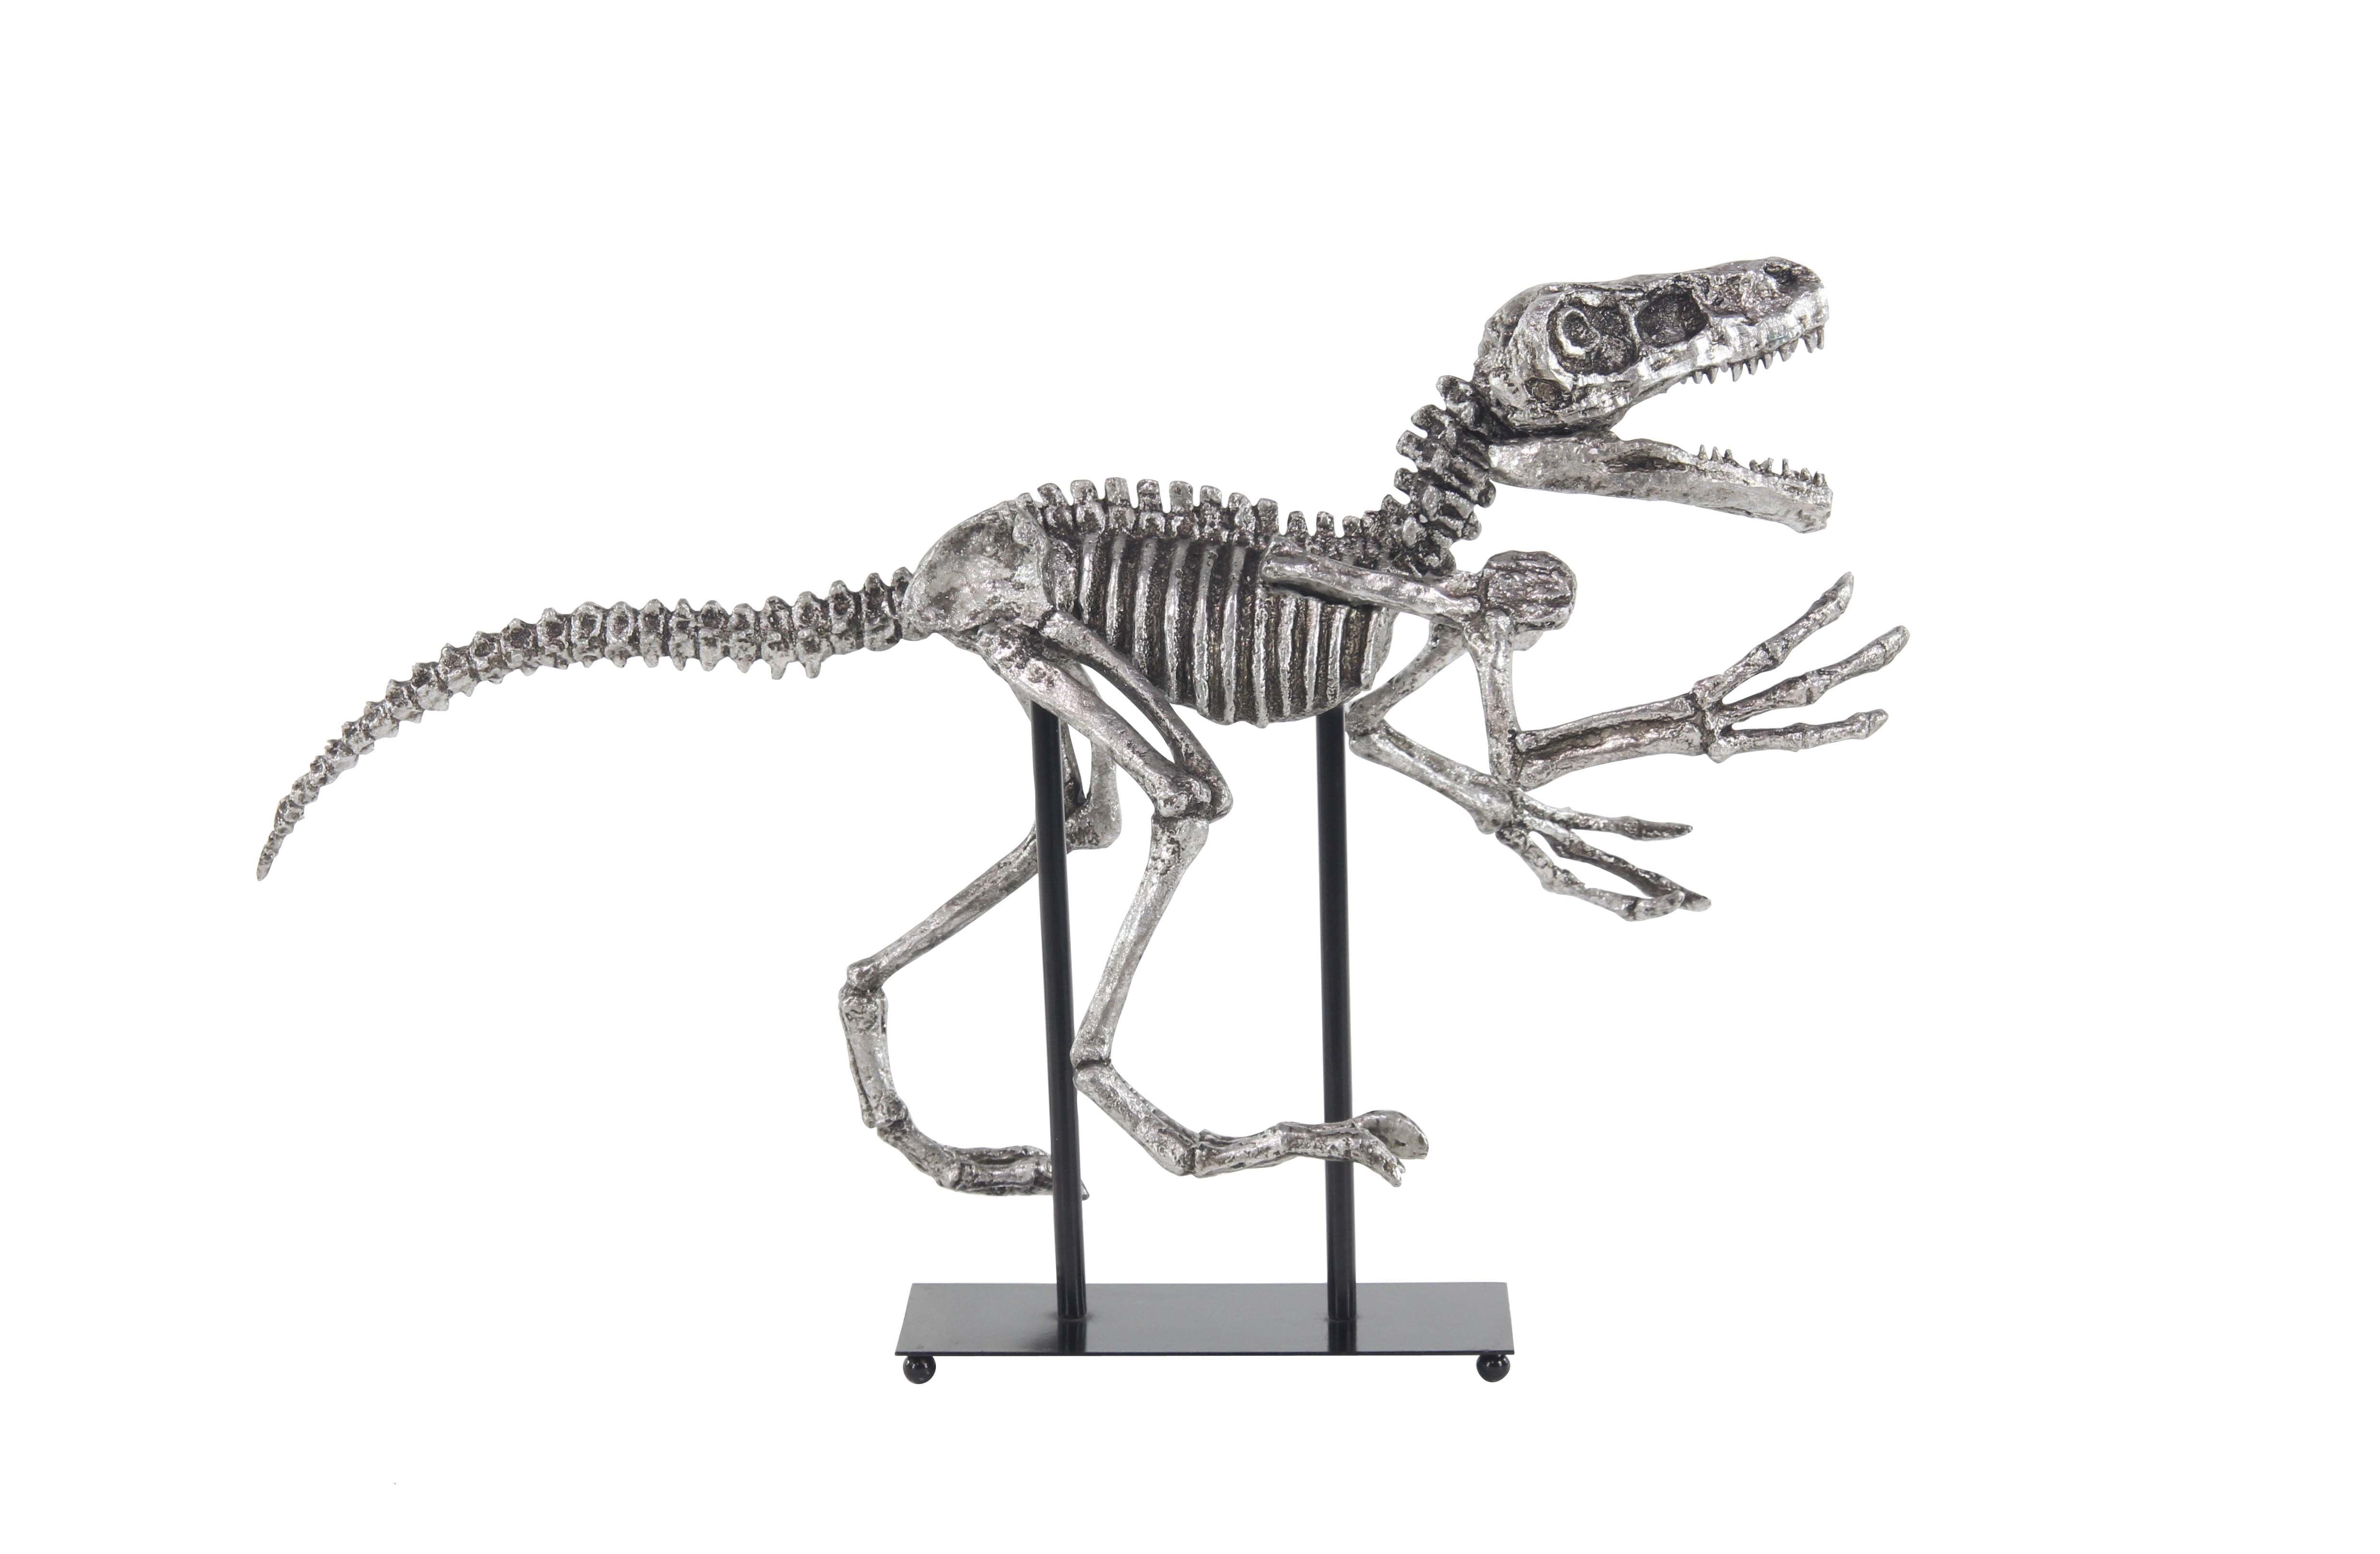 Decmode Contemporary Iron and Resin Dinosaur Skeleton Sculpture, Metallic Black by DecMode